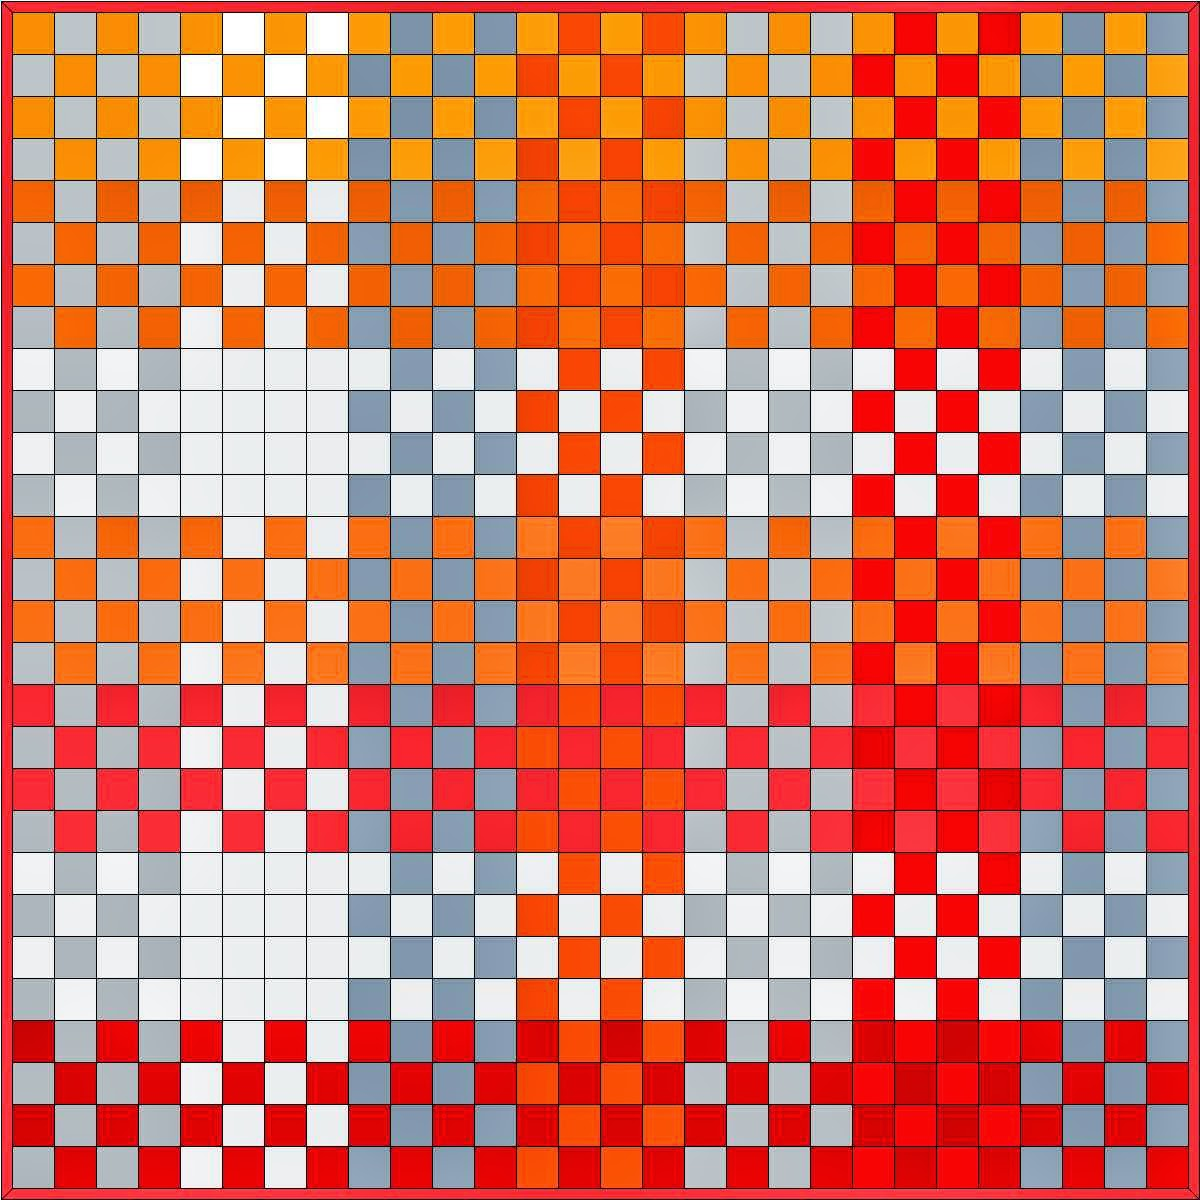 Sew Fresh Quilts: St. Louis 16 Patch quilt block tutorial : plaid quilt pattern - Adamdwight.com